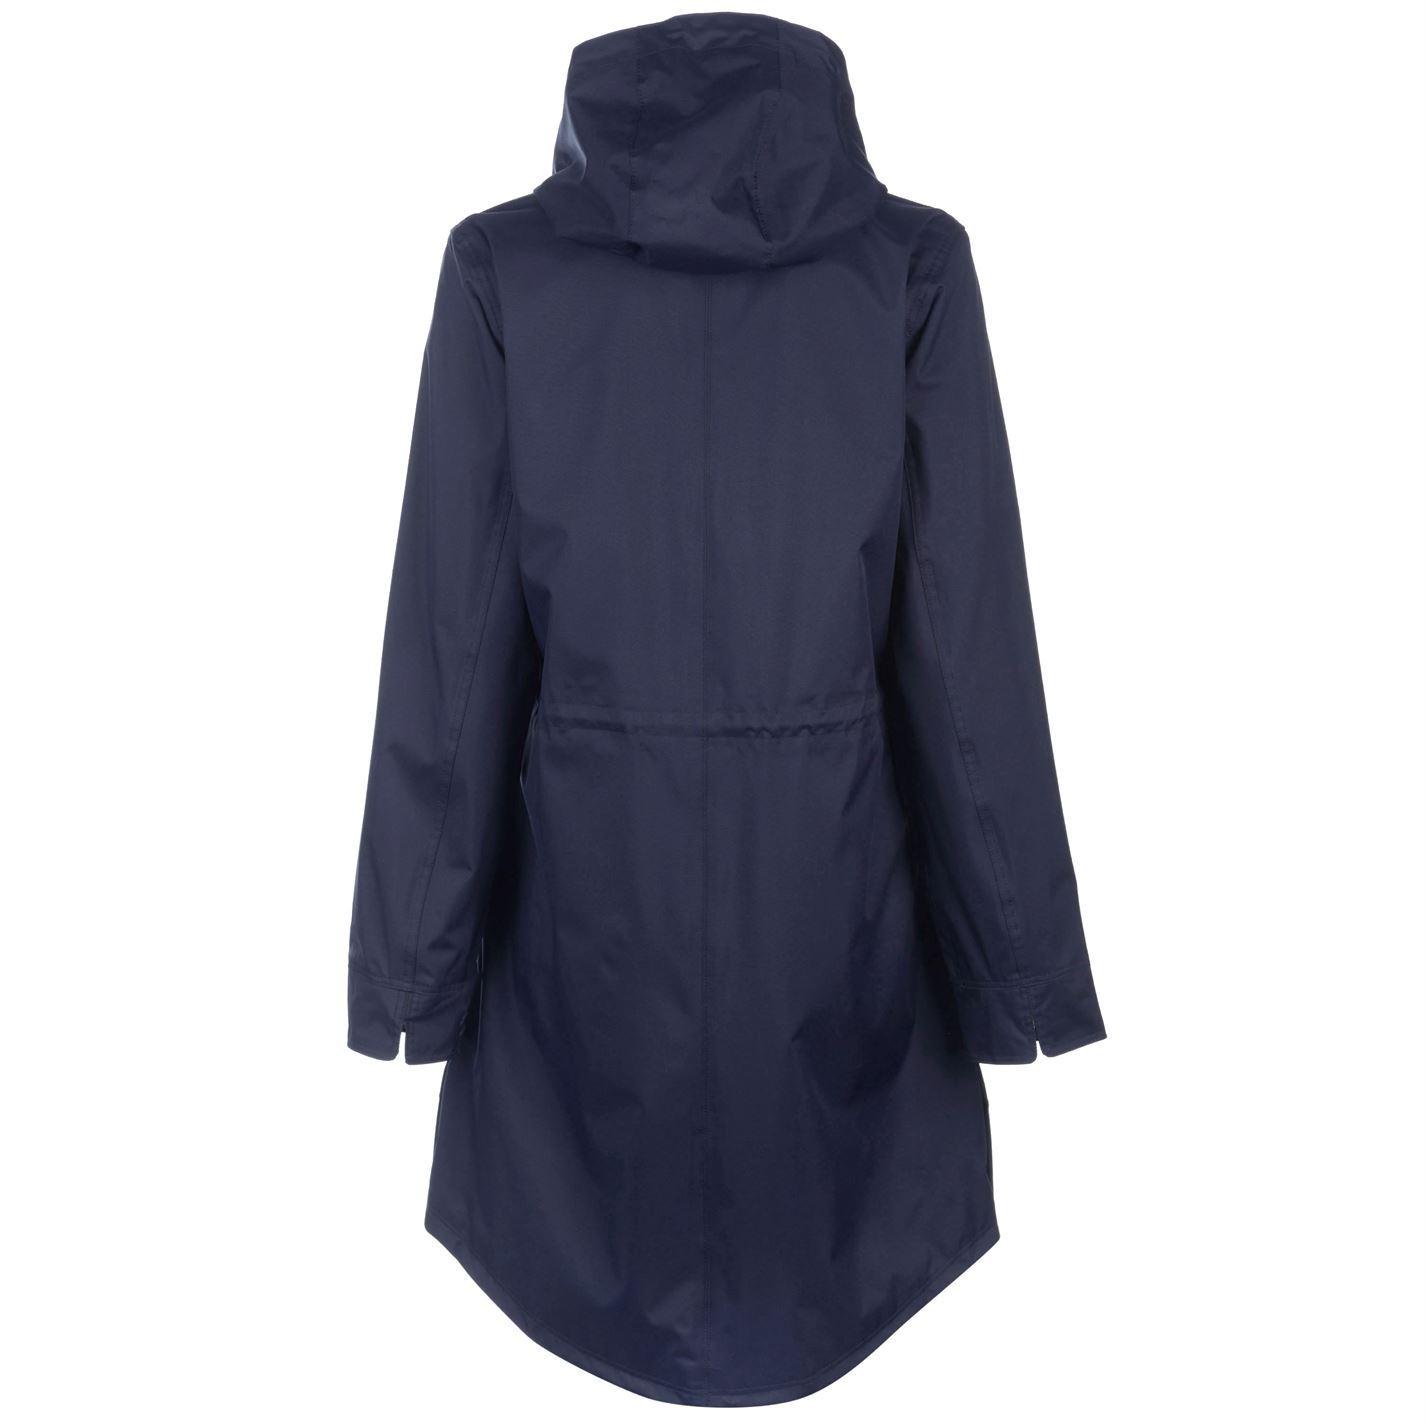 Rachel Zu Murphy Blau Reitjacke Damen Wasserdichter Mantel Jack Details Oberbekleidung kOPNw80Xn